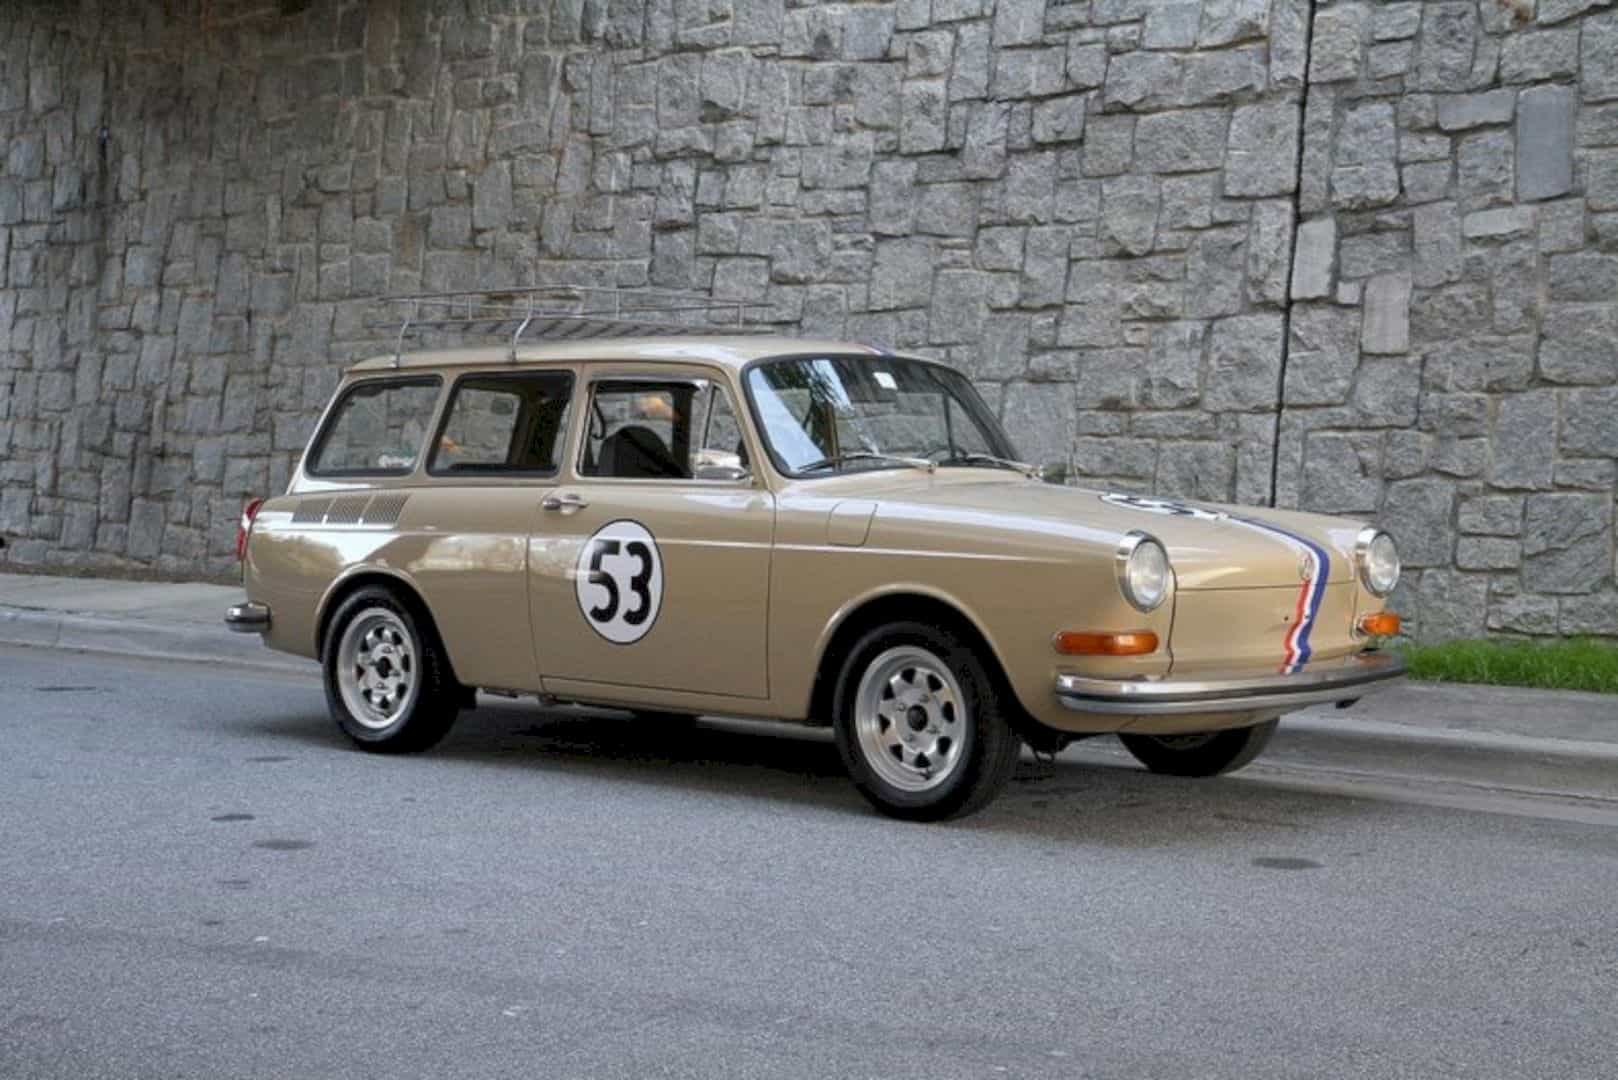 1972 Volkswagen Type 3 Squareback 9